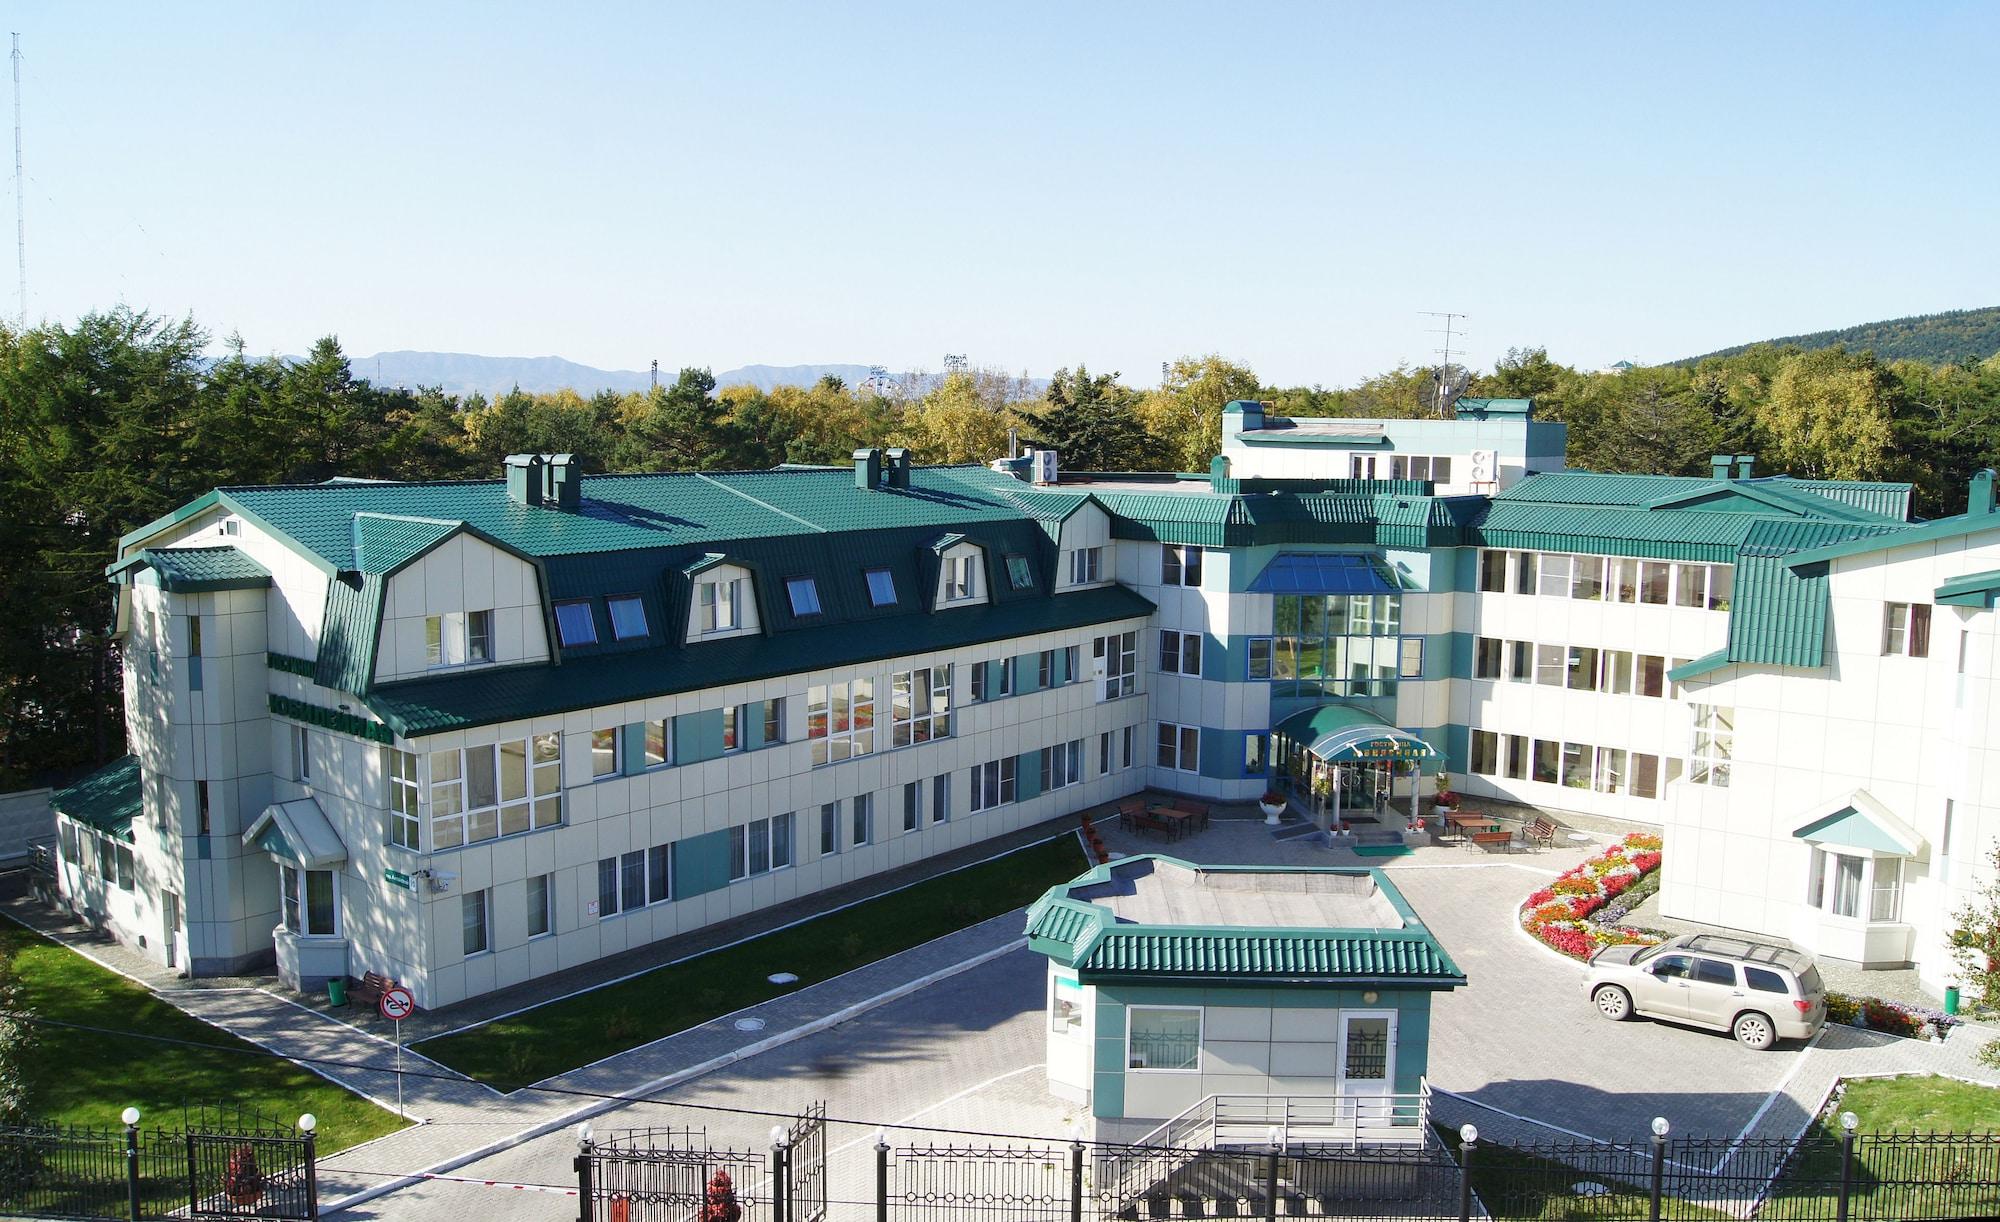 Yubileinaya, Anivskiy rayon